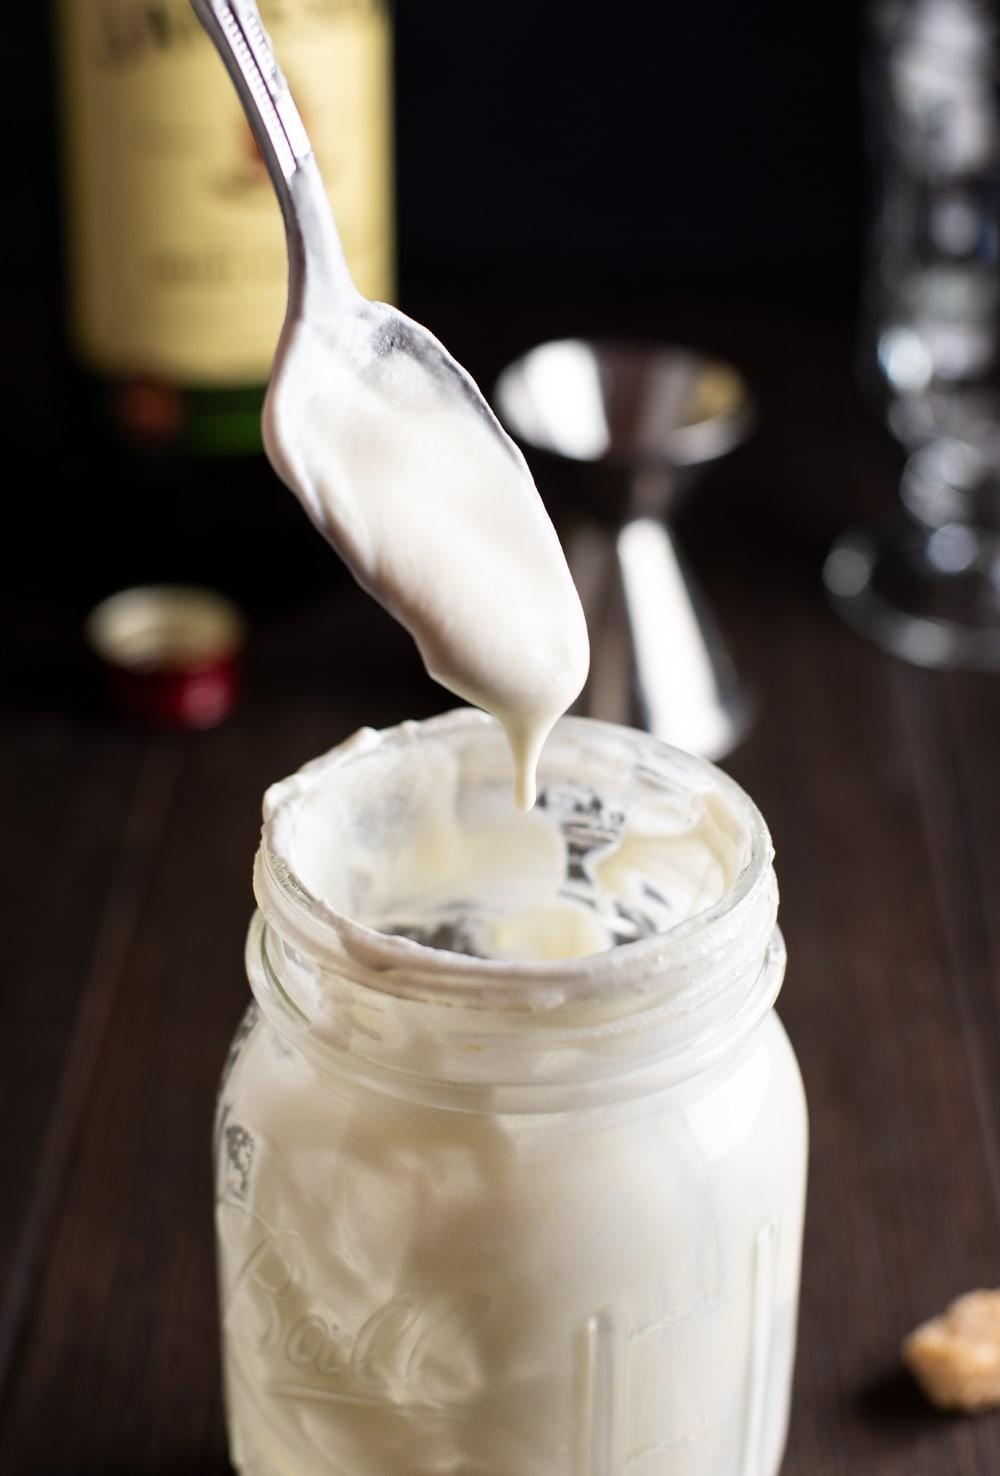 San Francisco Inspired Irish Coffee Recipe - whipped cream